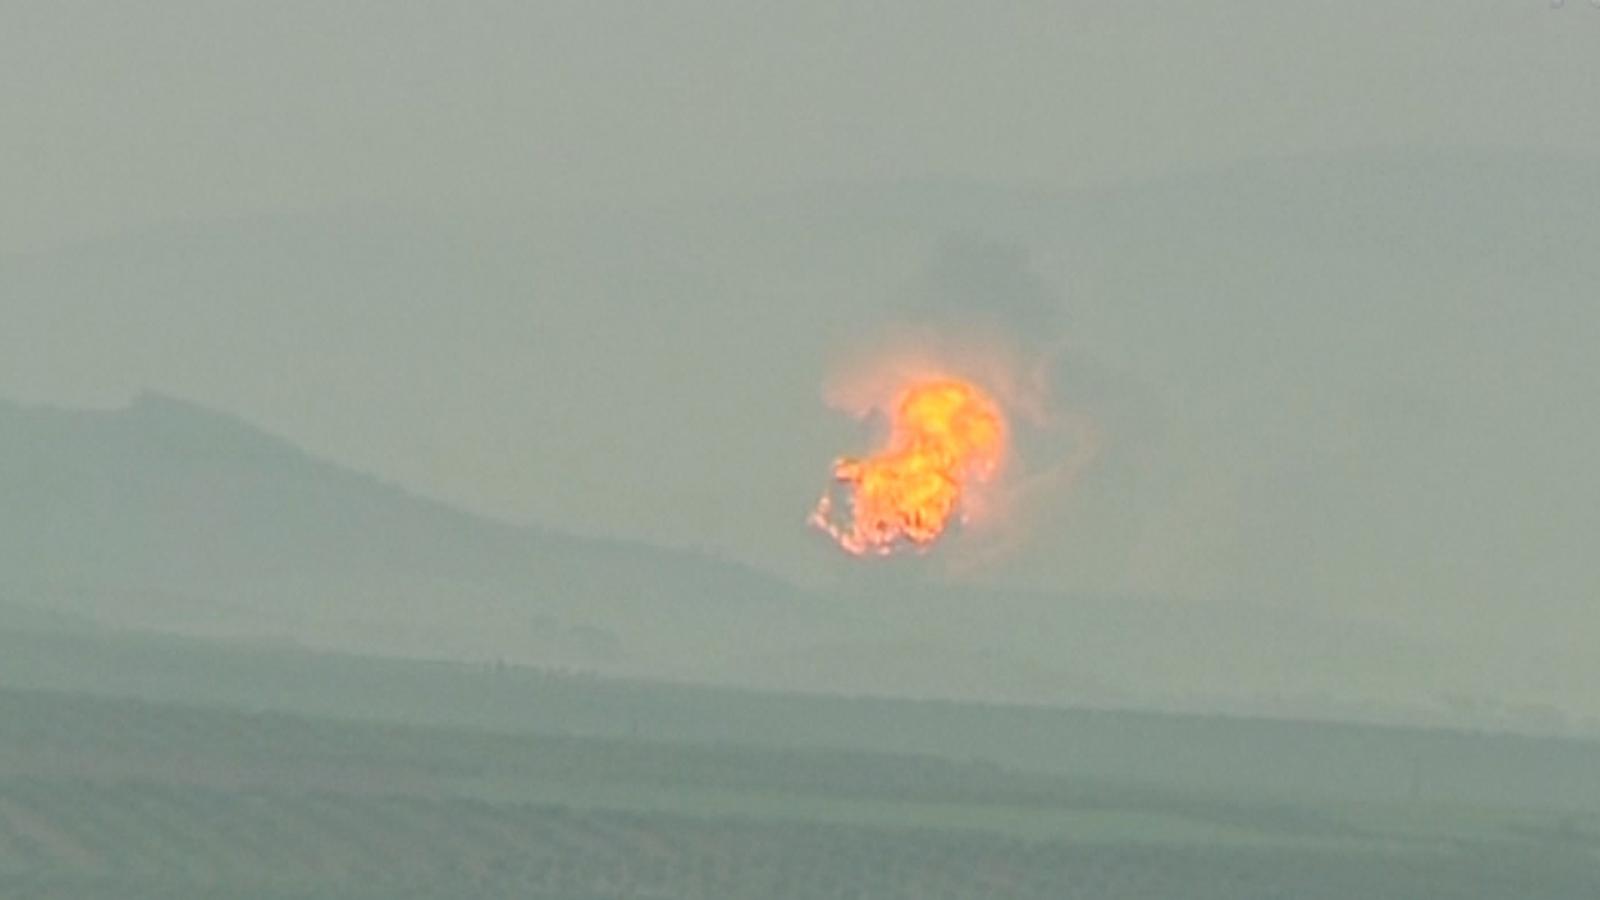 Turkey Shells US-backed Kurdish Militia In Syria's Afrin